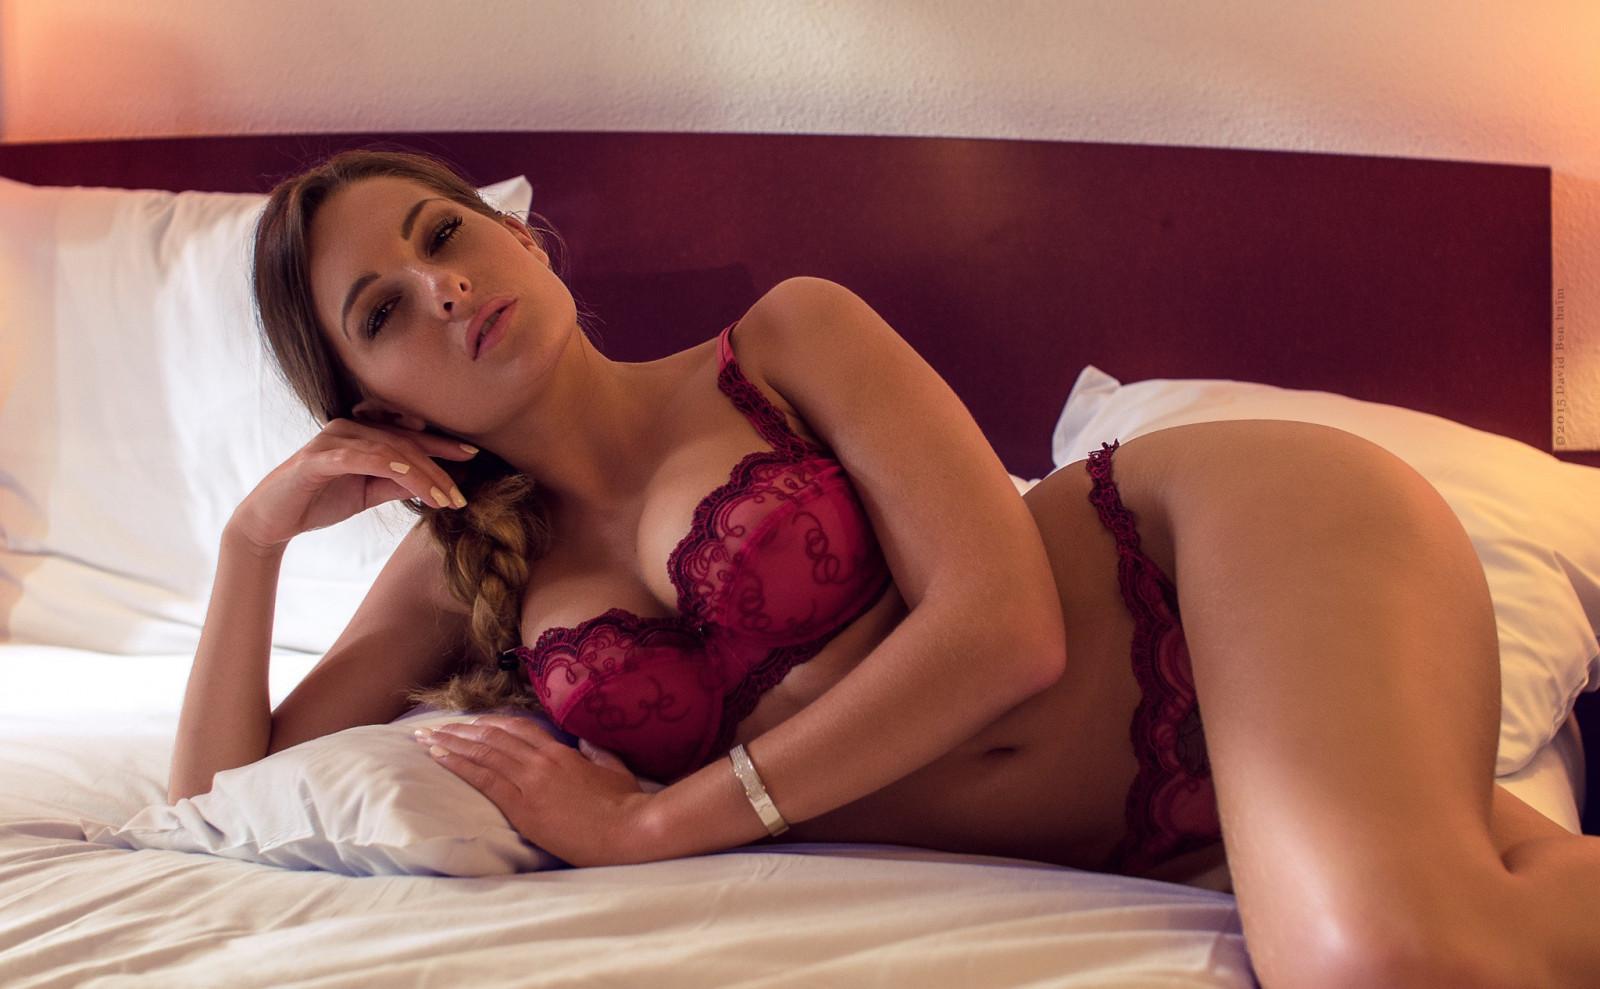 Andrea roth in lingerie skinny